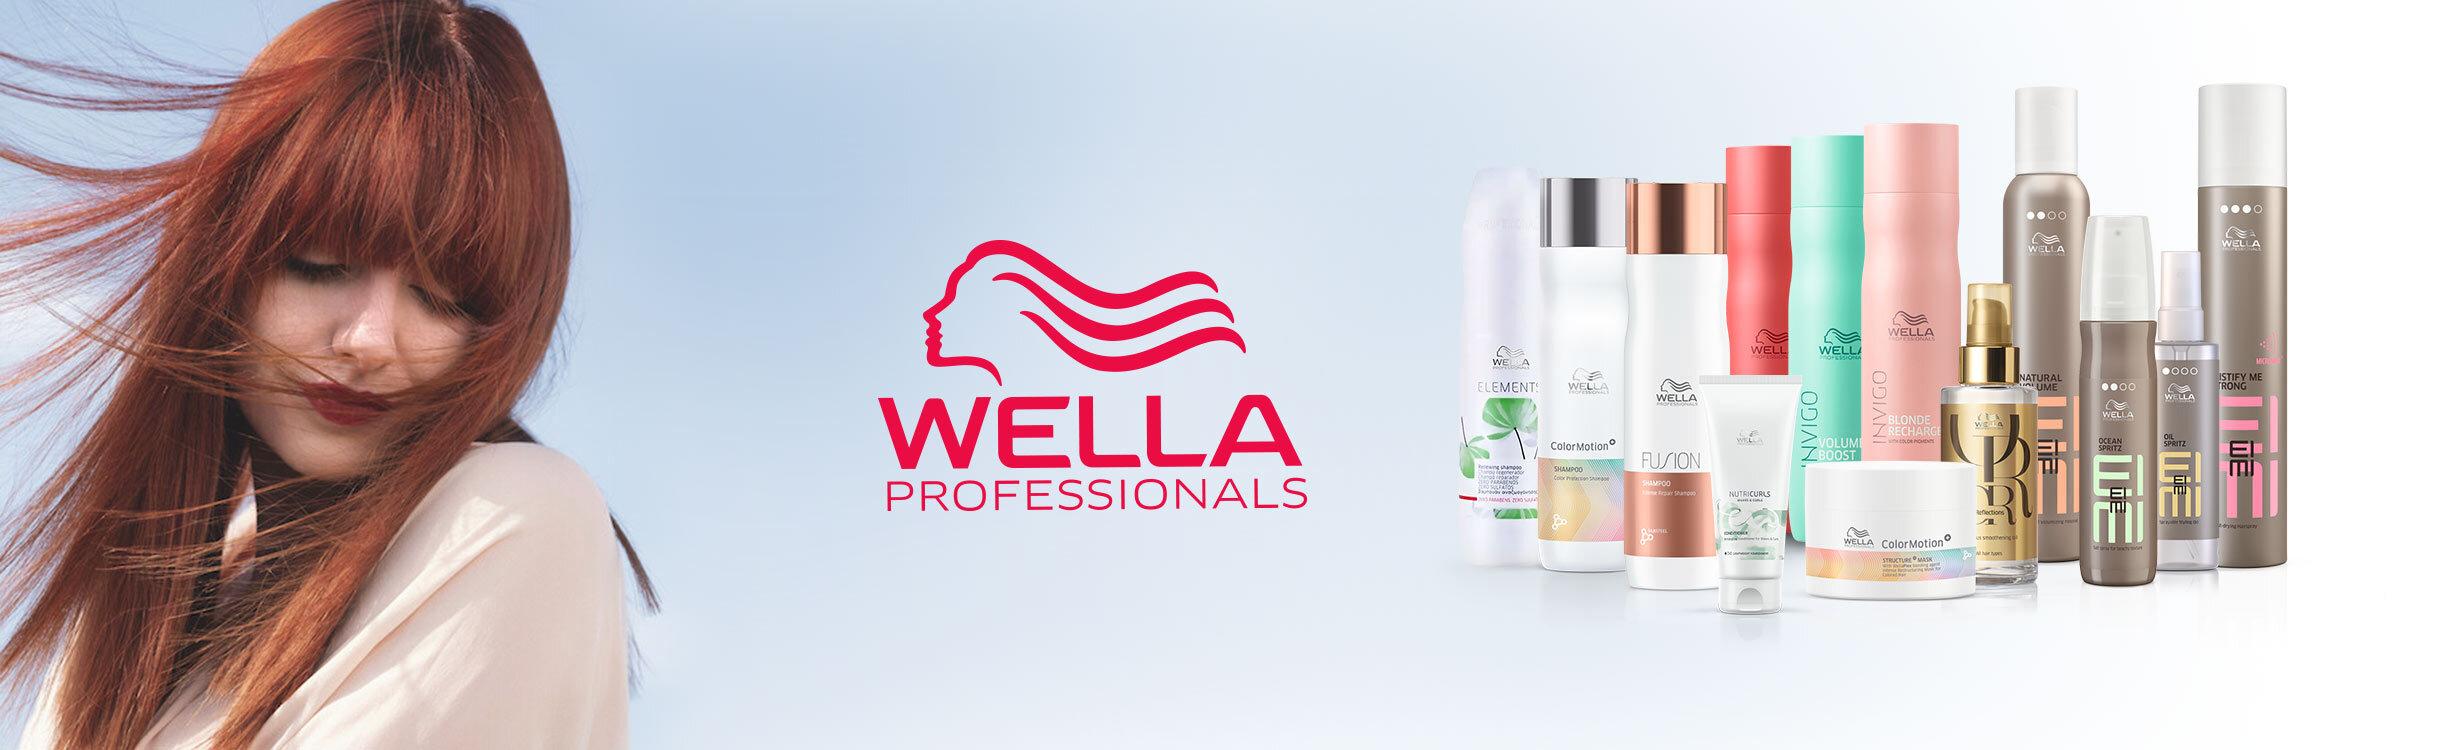 Tratamento Wella Professionals